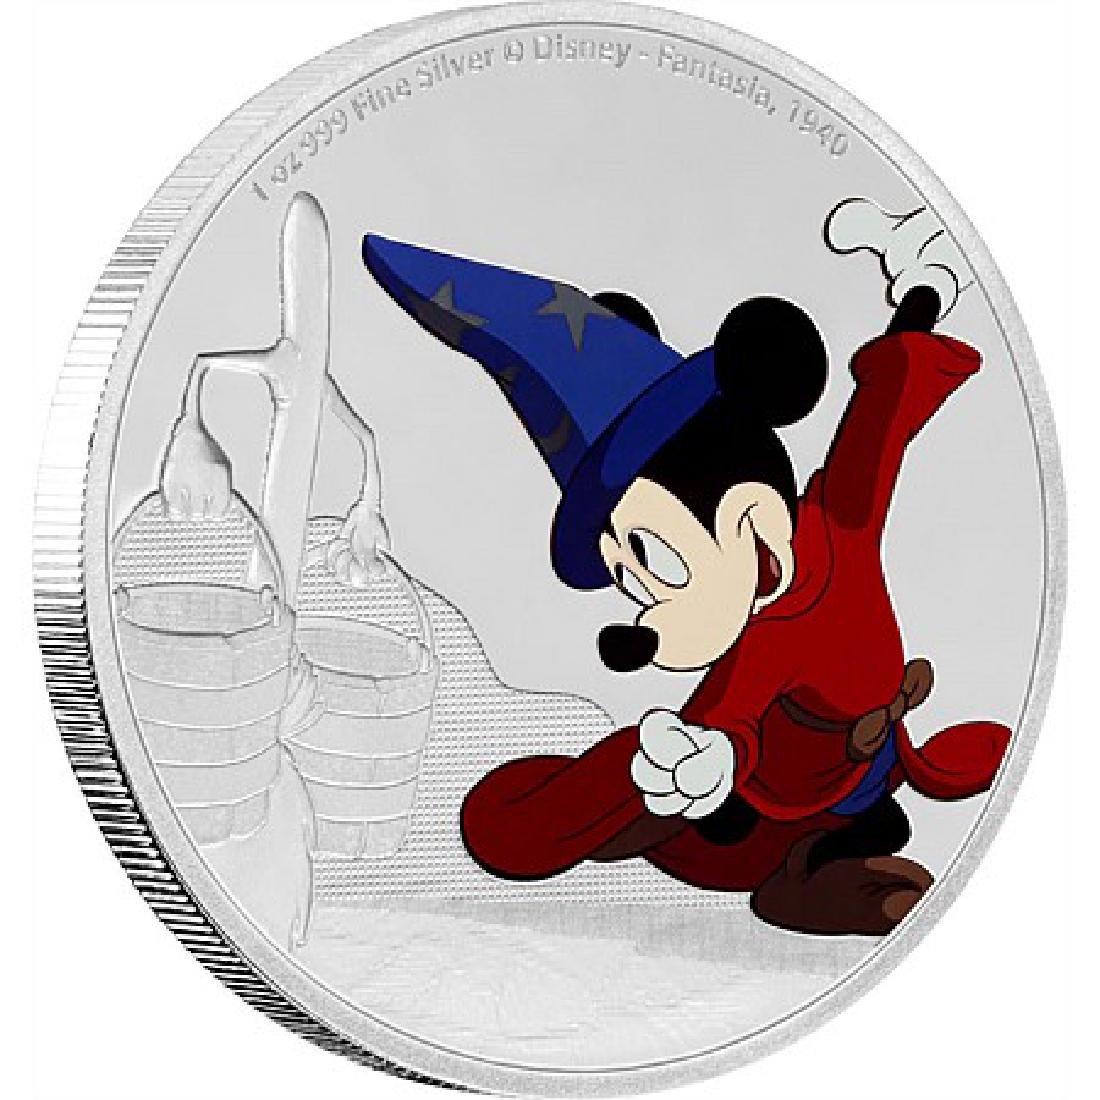 2017 1 oz Silver $2 Mickey Through the Ages: Fantasia